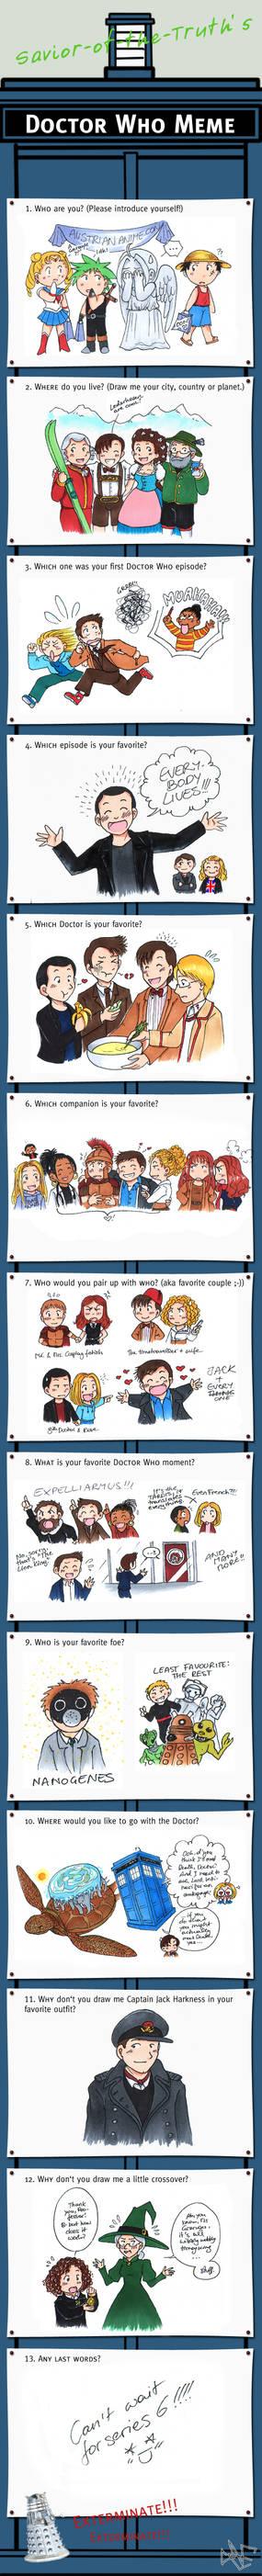 Doctor Who meme no.2